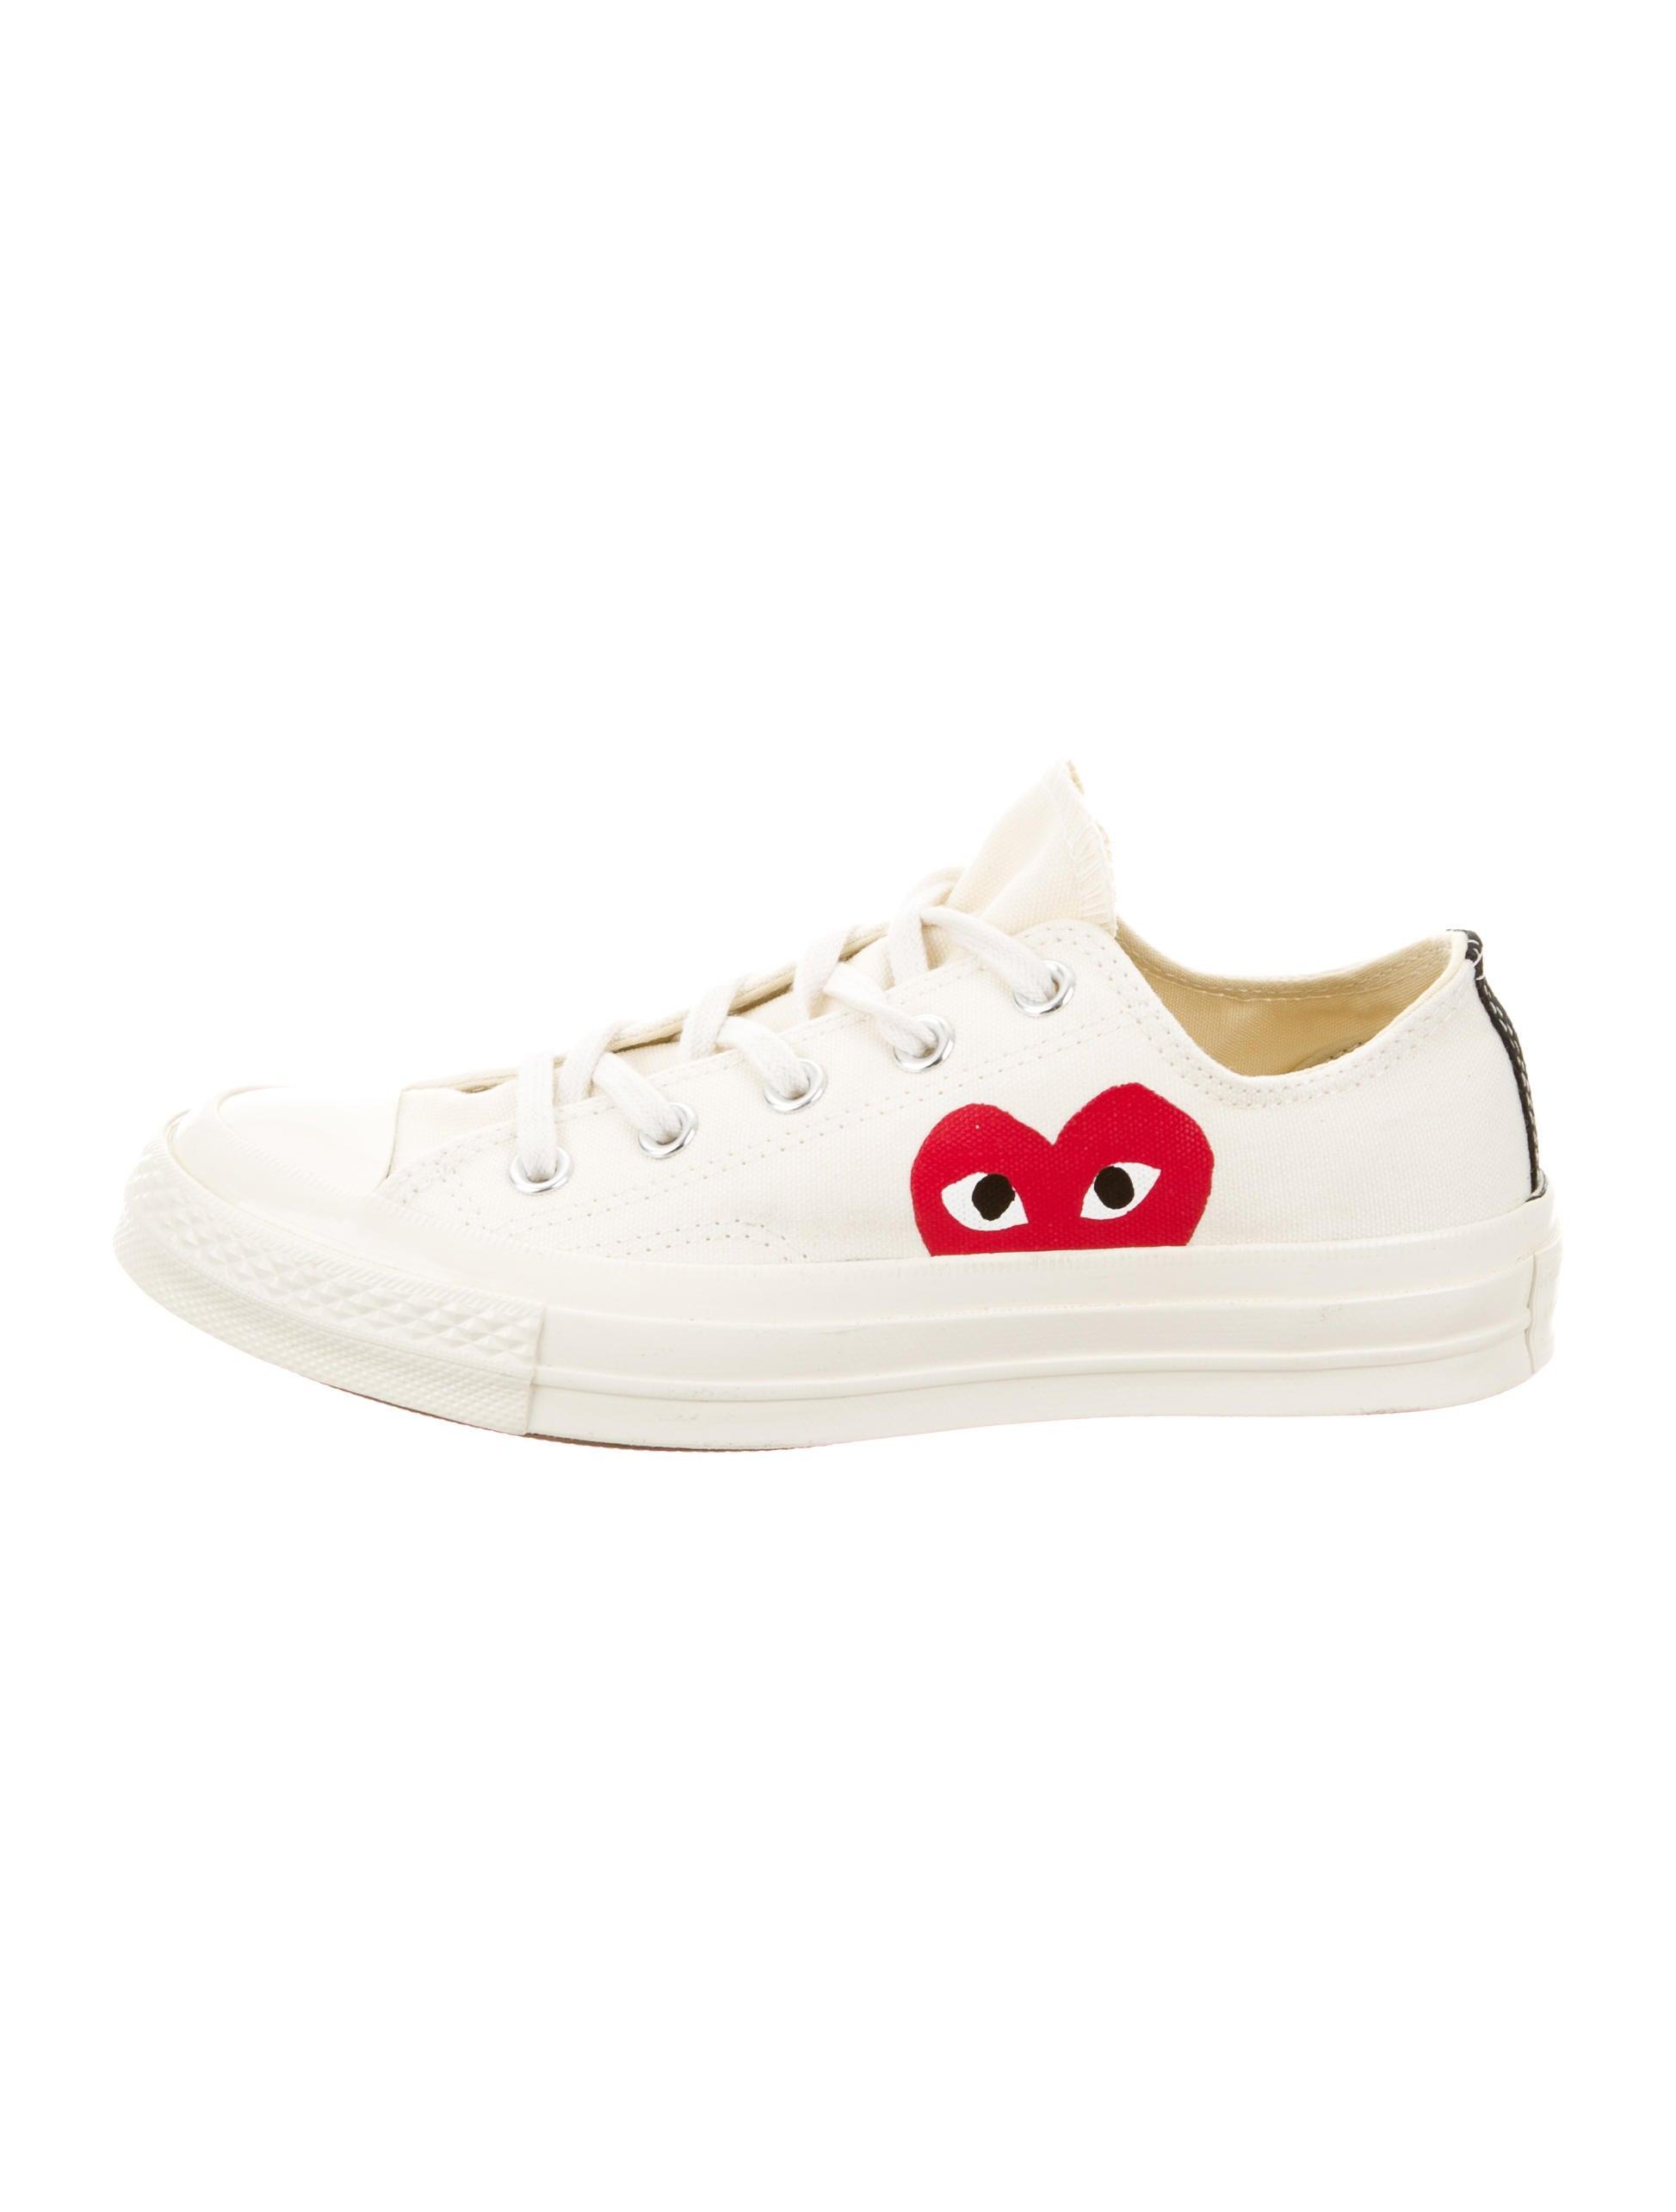 7ef5db2cc1a4fe Women · Shoes  Comme des Garçons Play x Converse Canvas Low-Top Sneakers.  Canvas Low-Top Sneakers